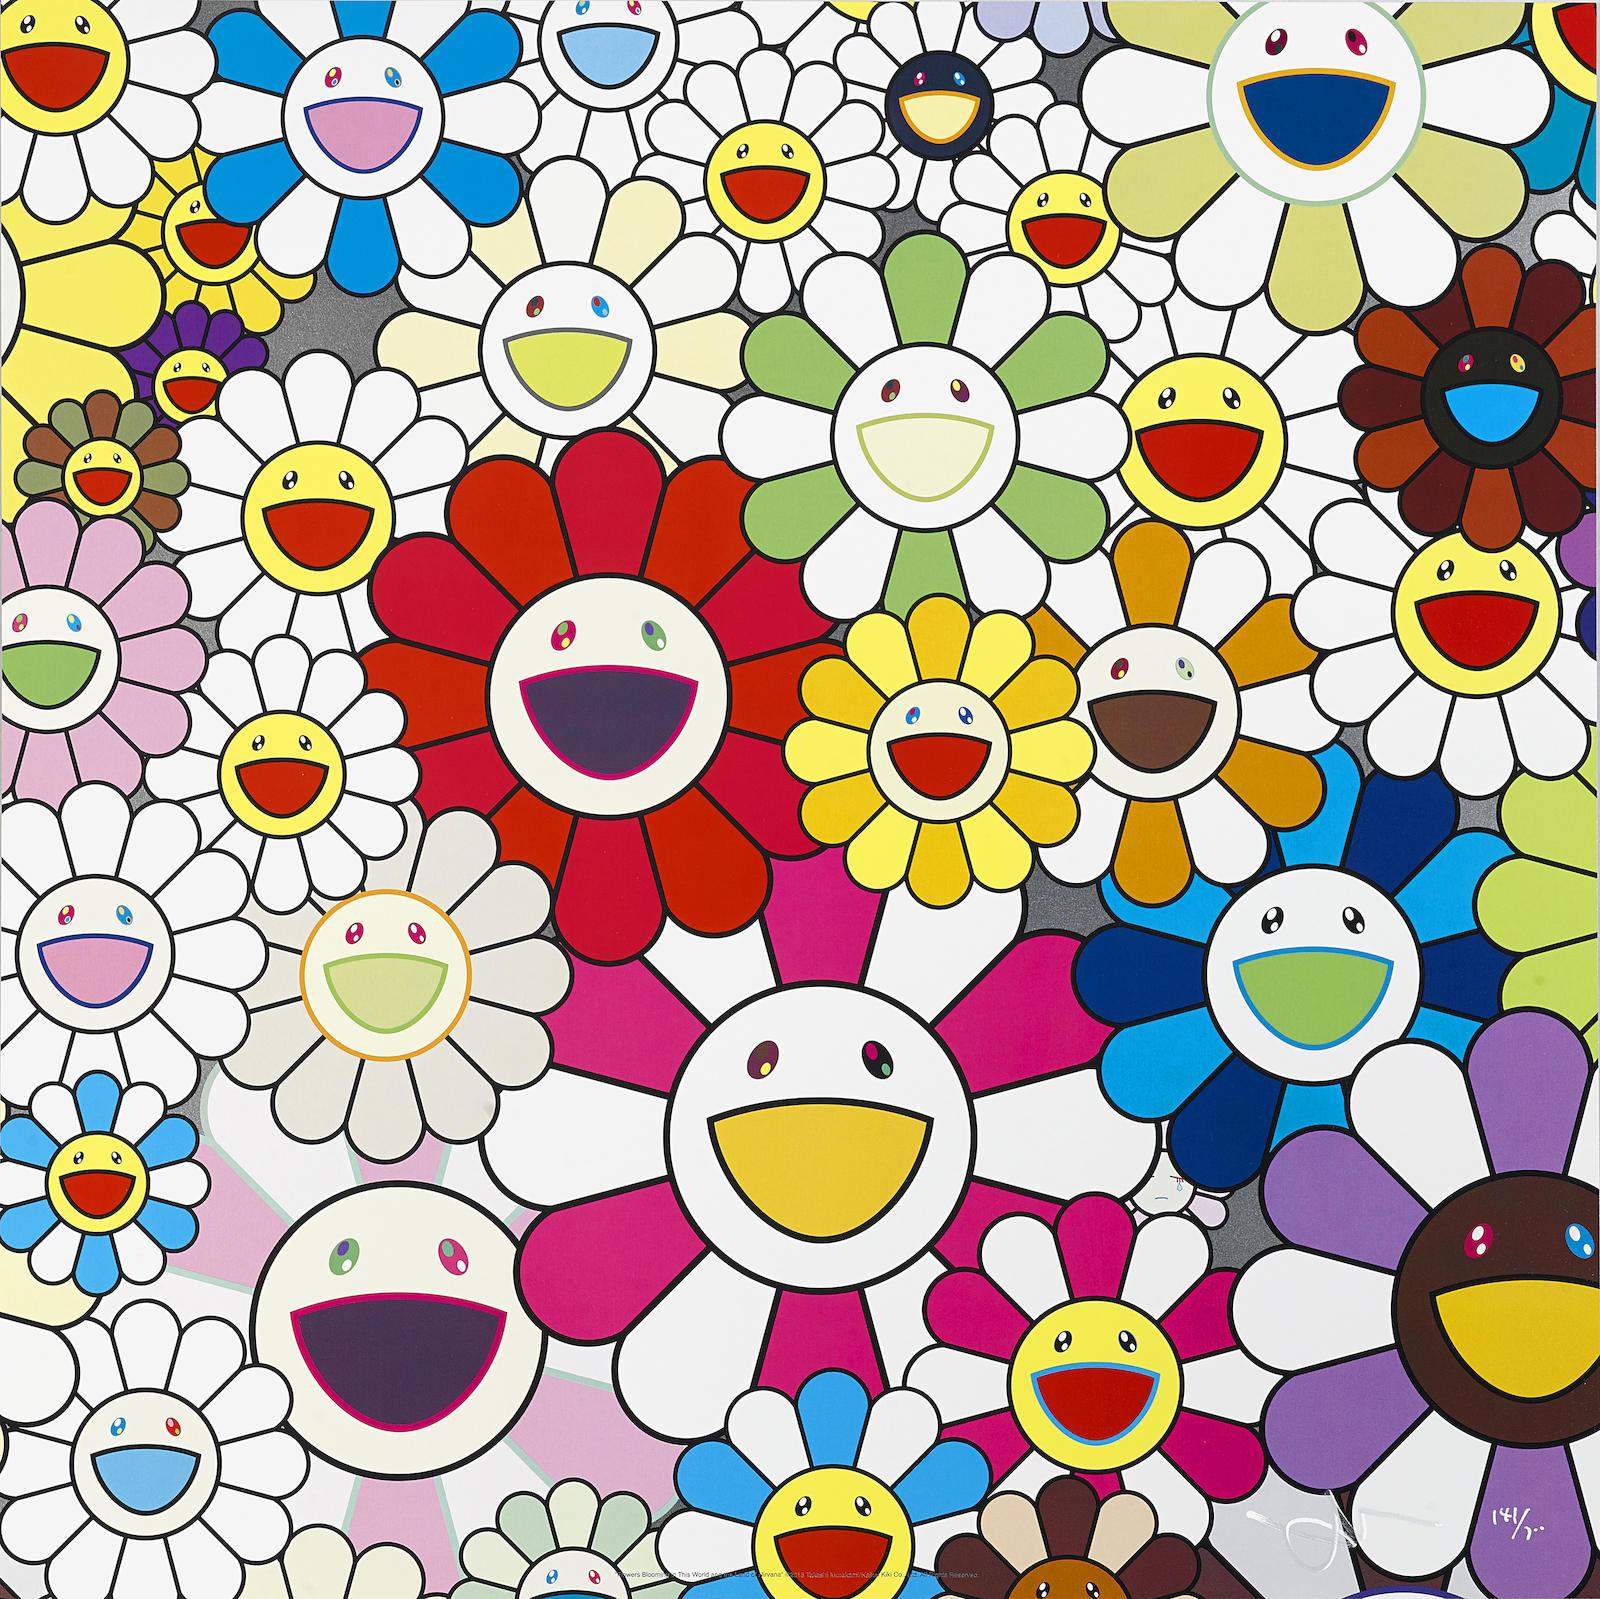 Takashi Murakami-Kaikai Kiki News No. 2; Flowers Blooming in the World and the Land of Nirvana, 2008; 2013-2013